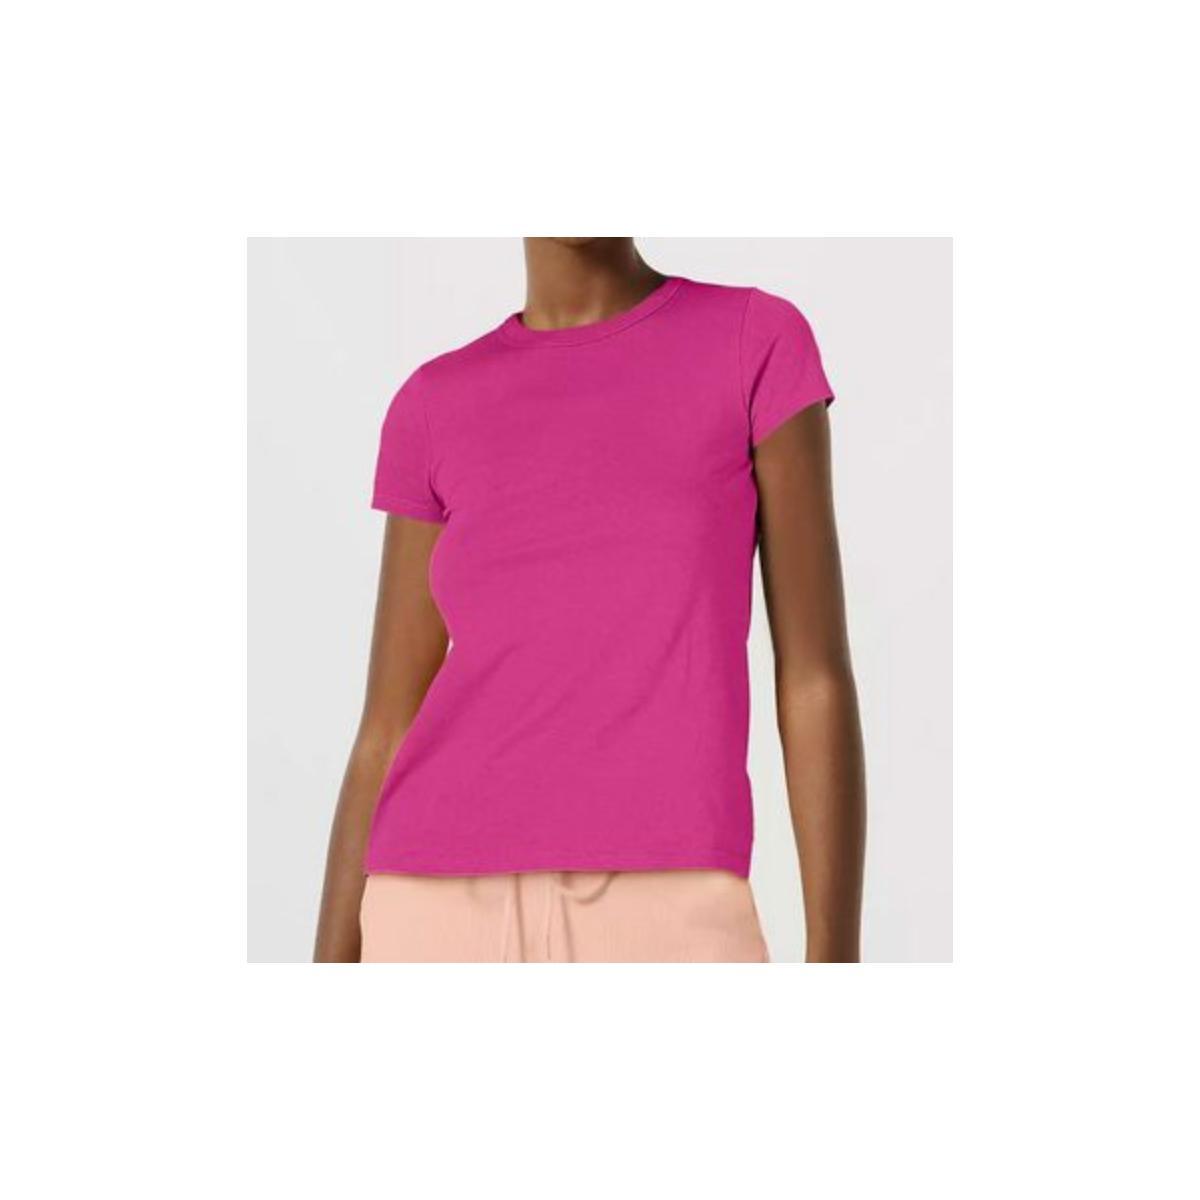 Blusa Feminina Hering 4f5u Kquen Pink